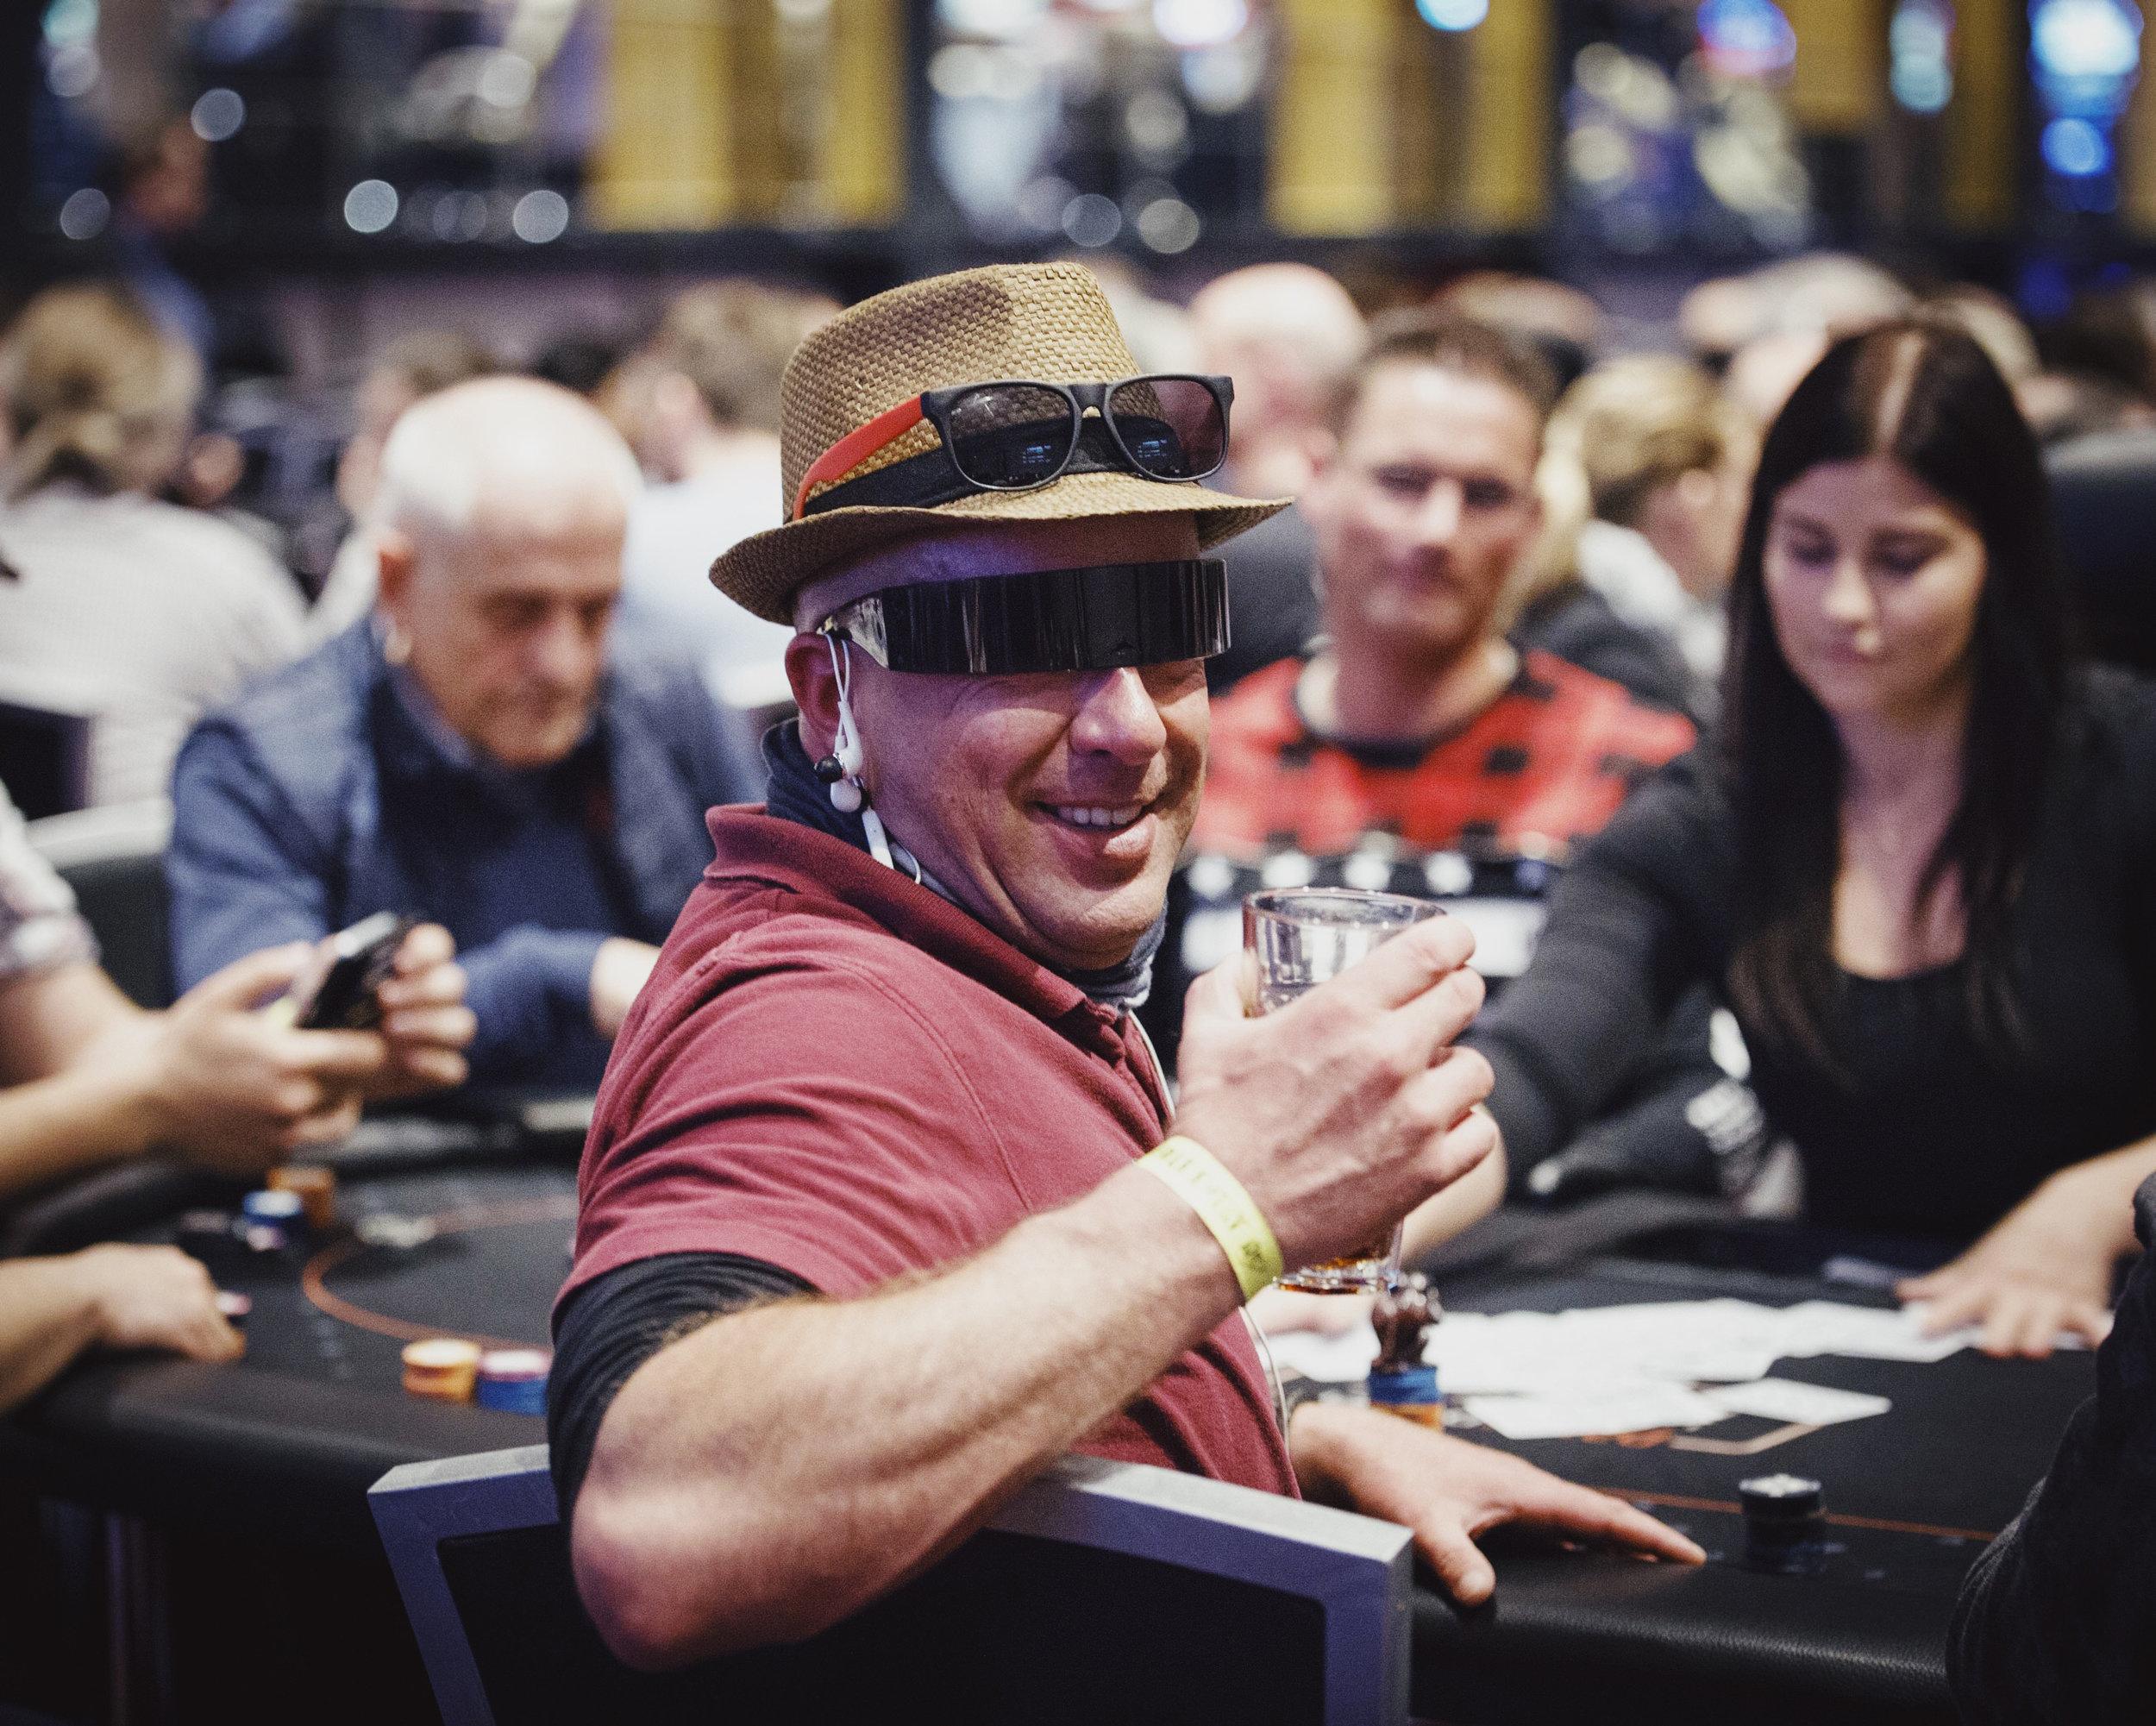 polina-shubkina-poker-028.JPG